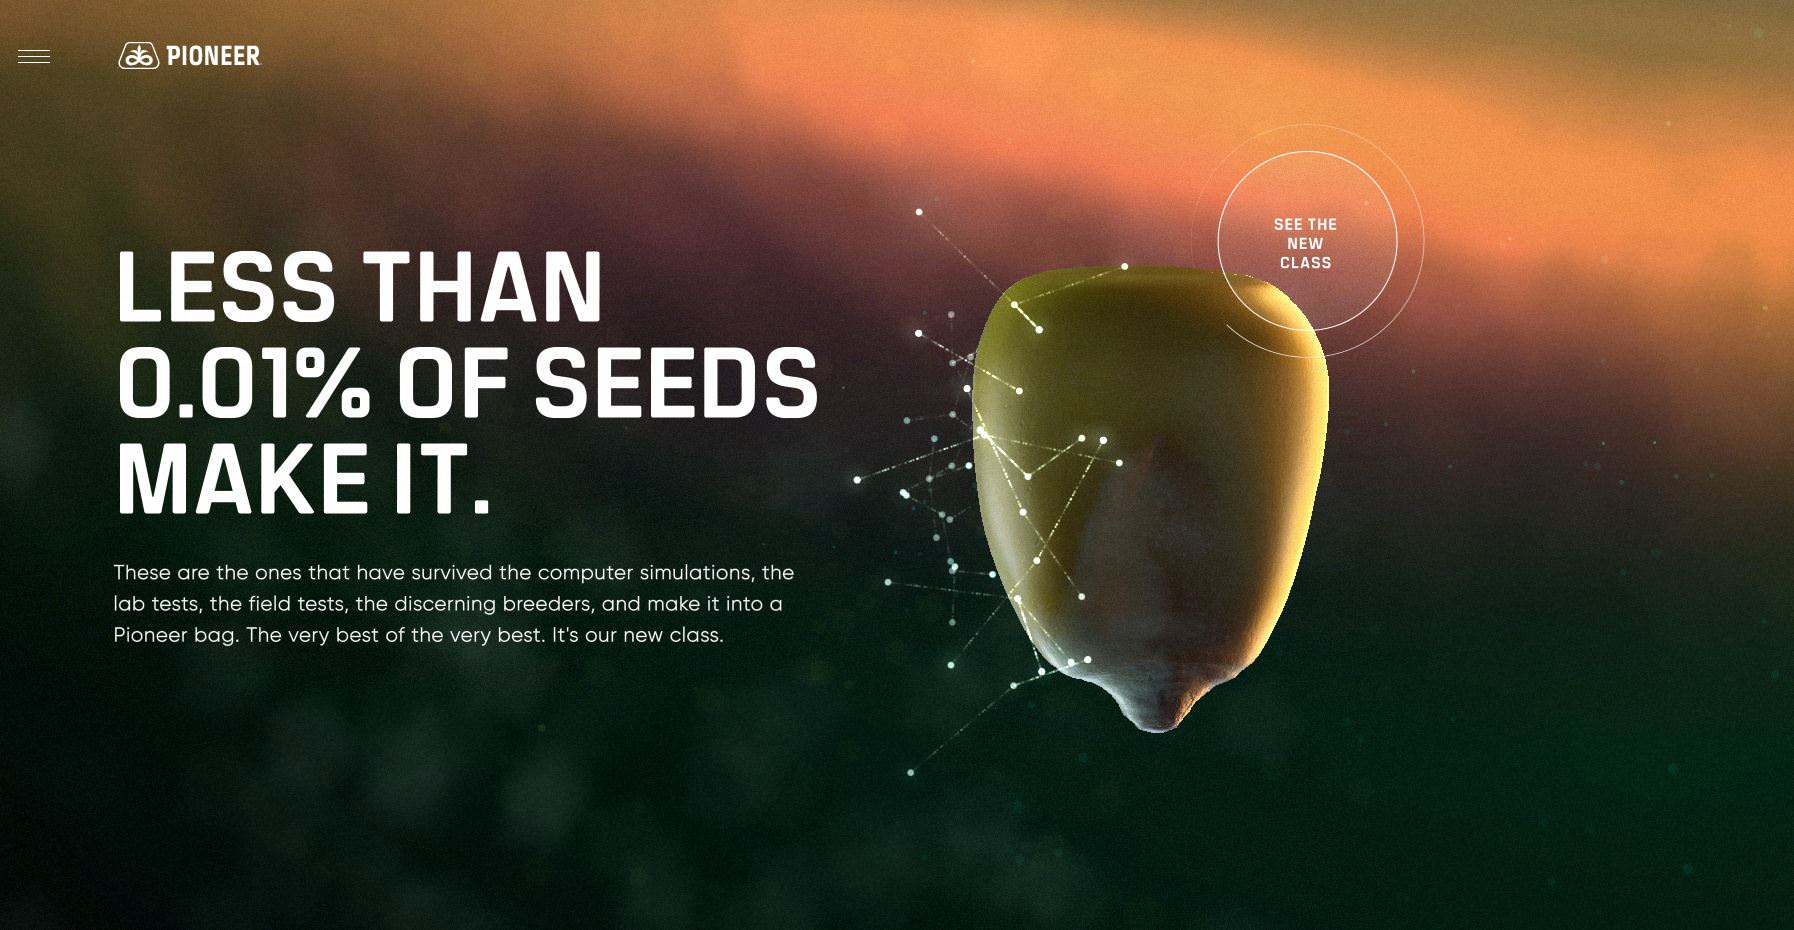 Corn, Revolutionized - Pioneer